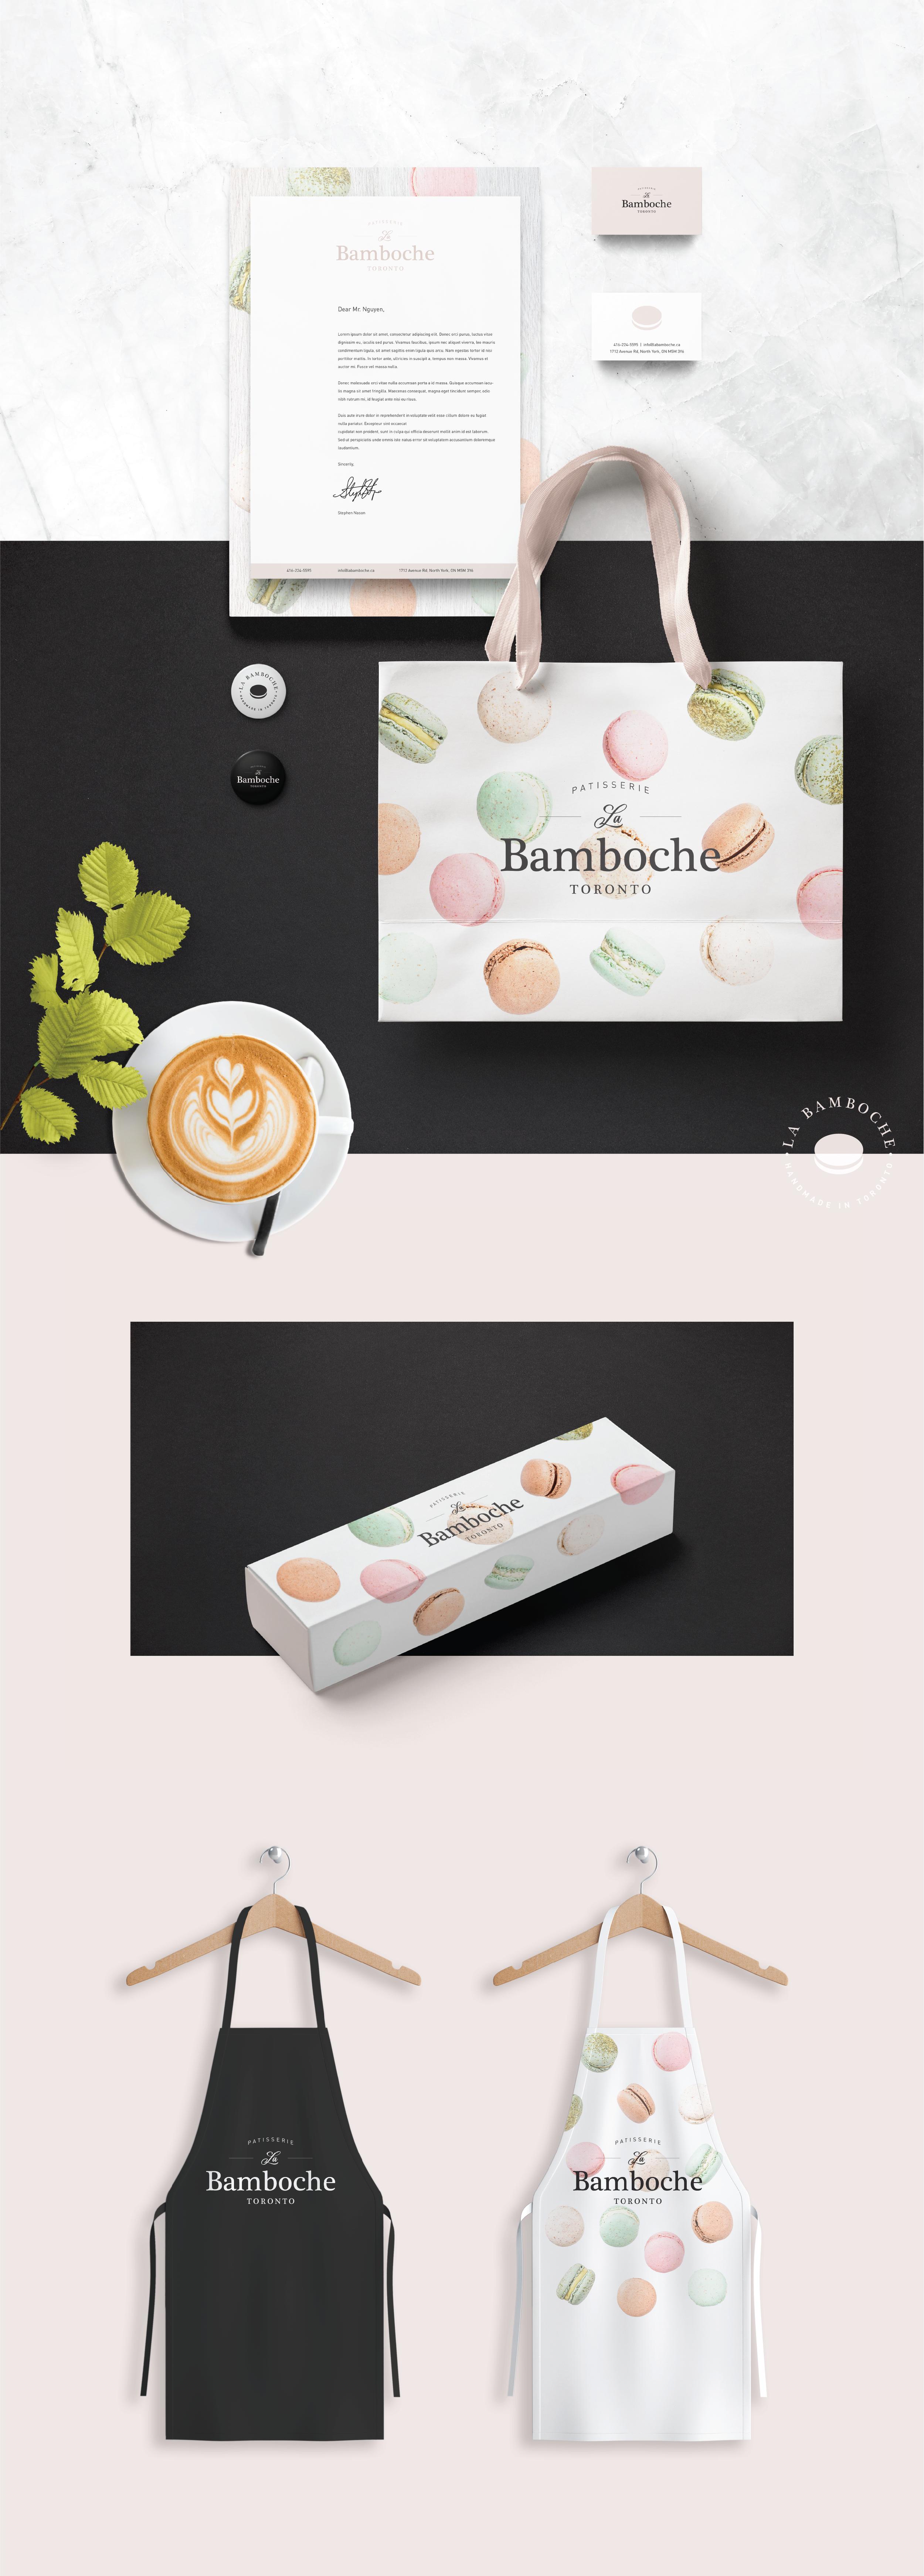 La Bamboche Project-04.png